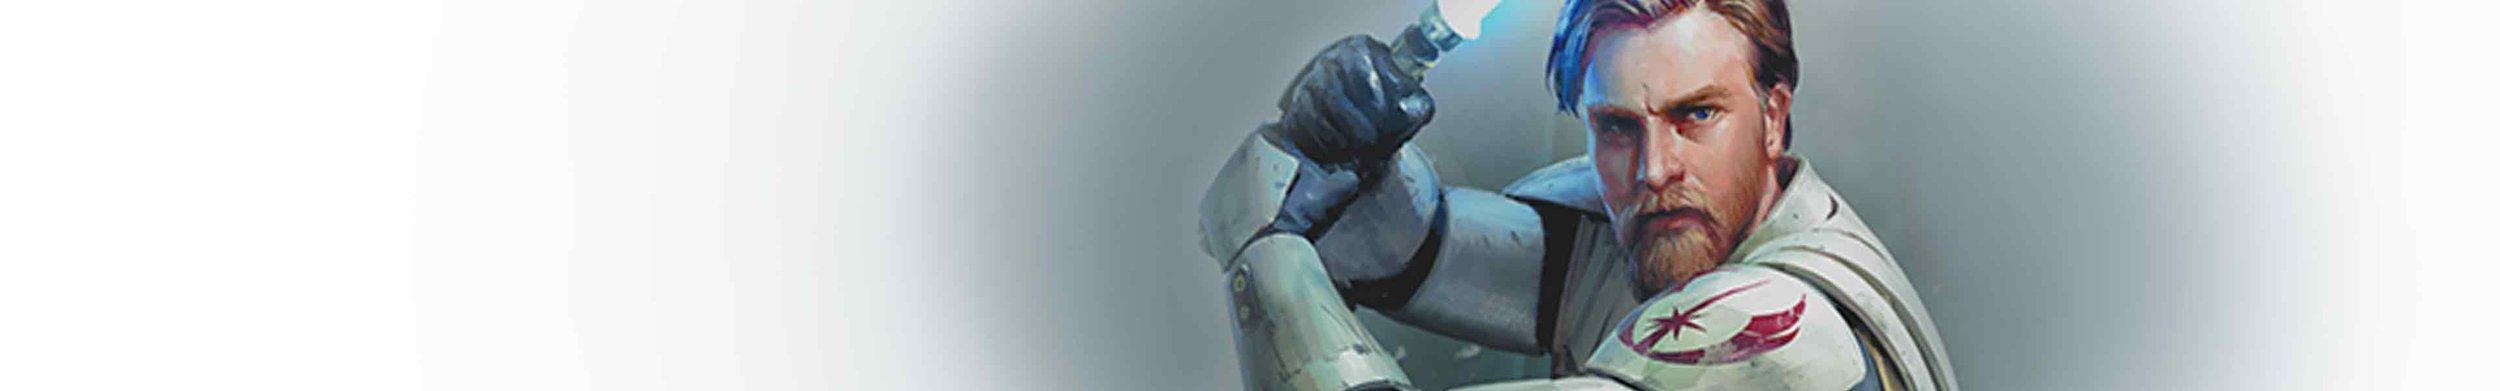 star-wars-destiny_convergence_banner-01-2x.jpg